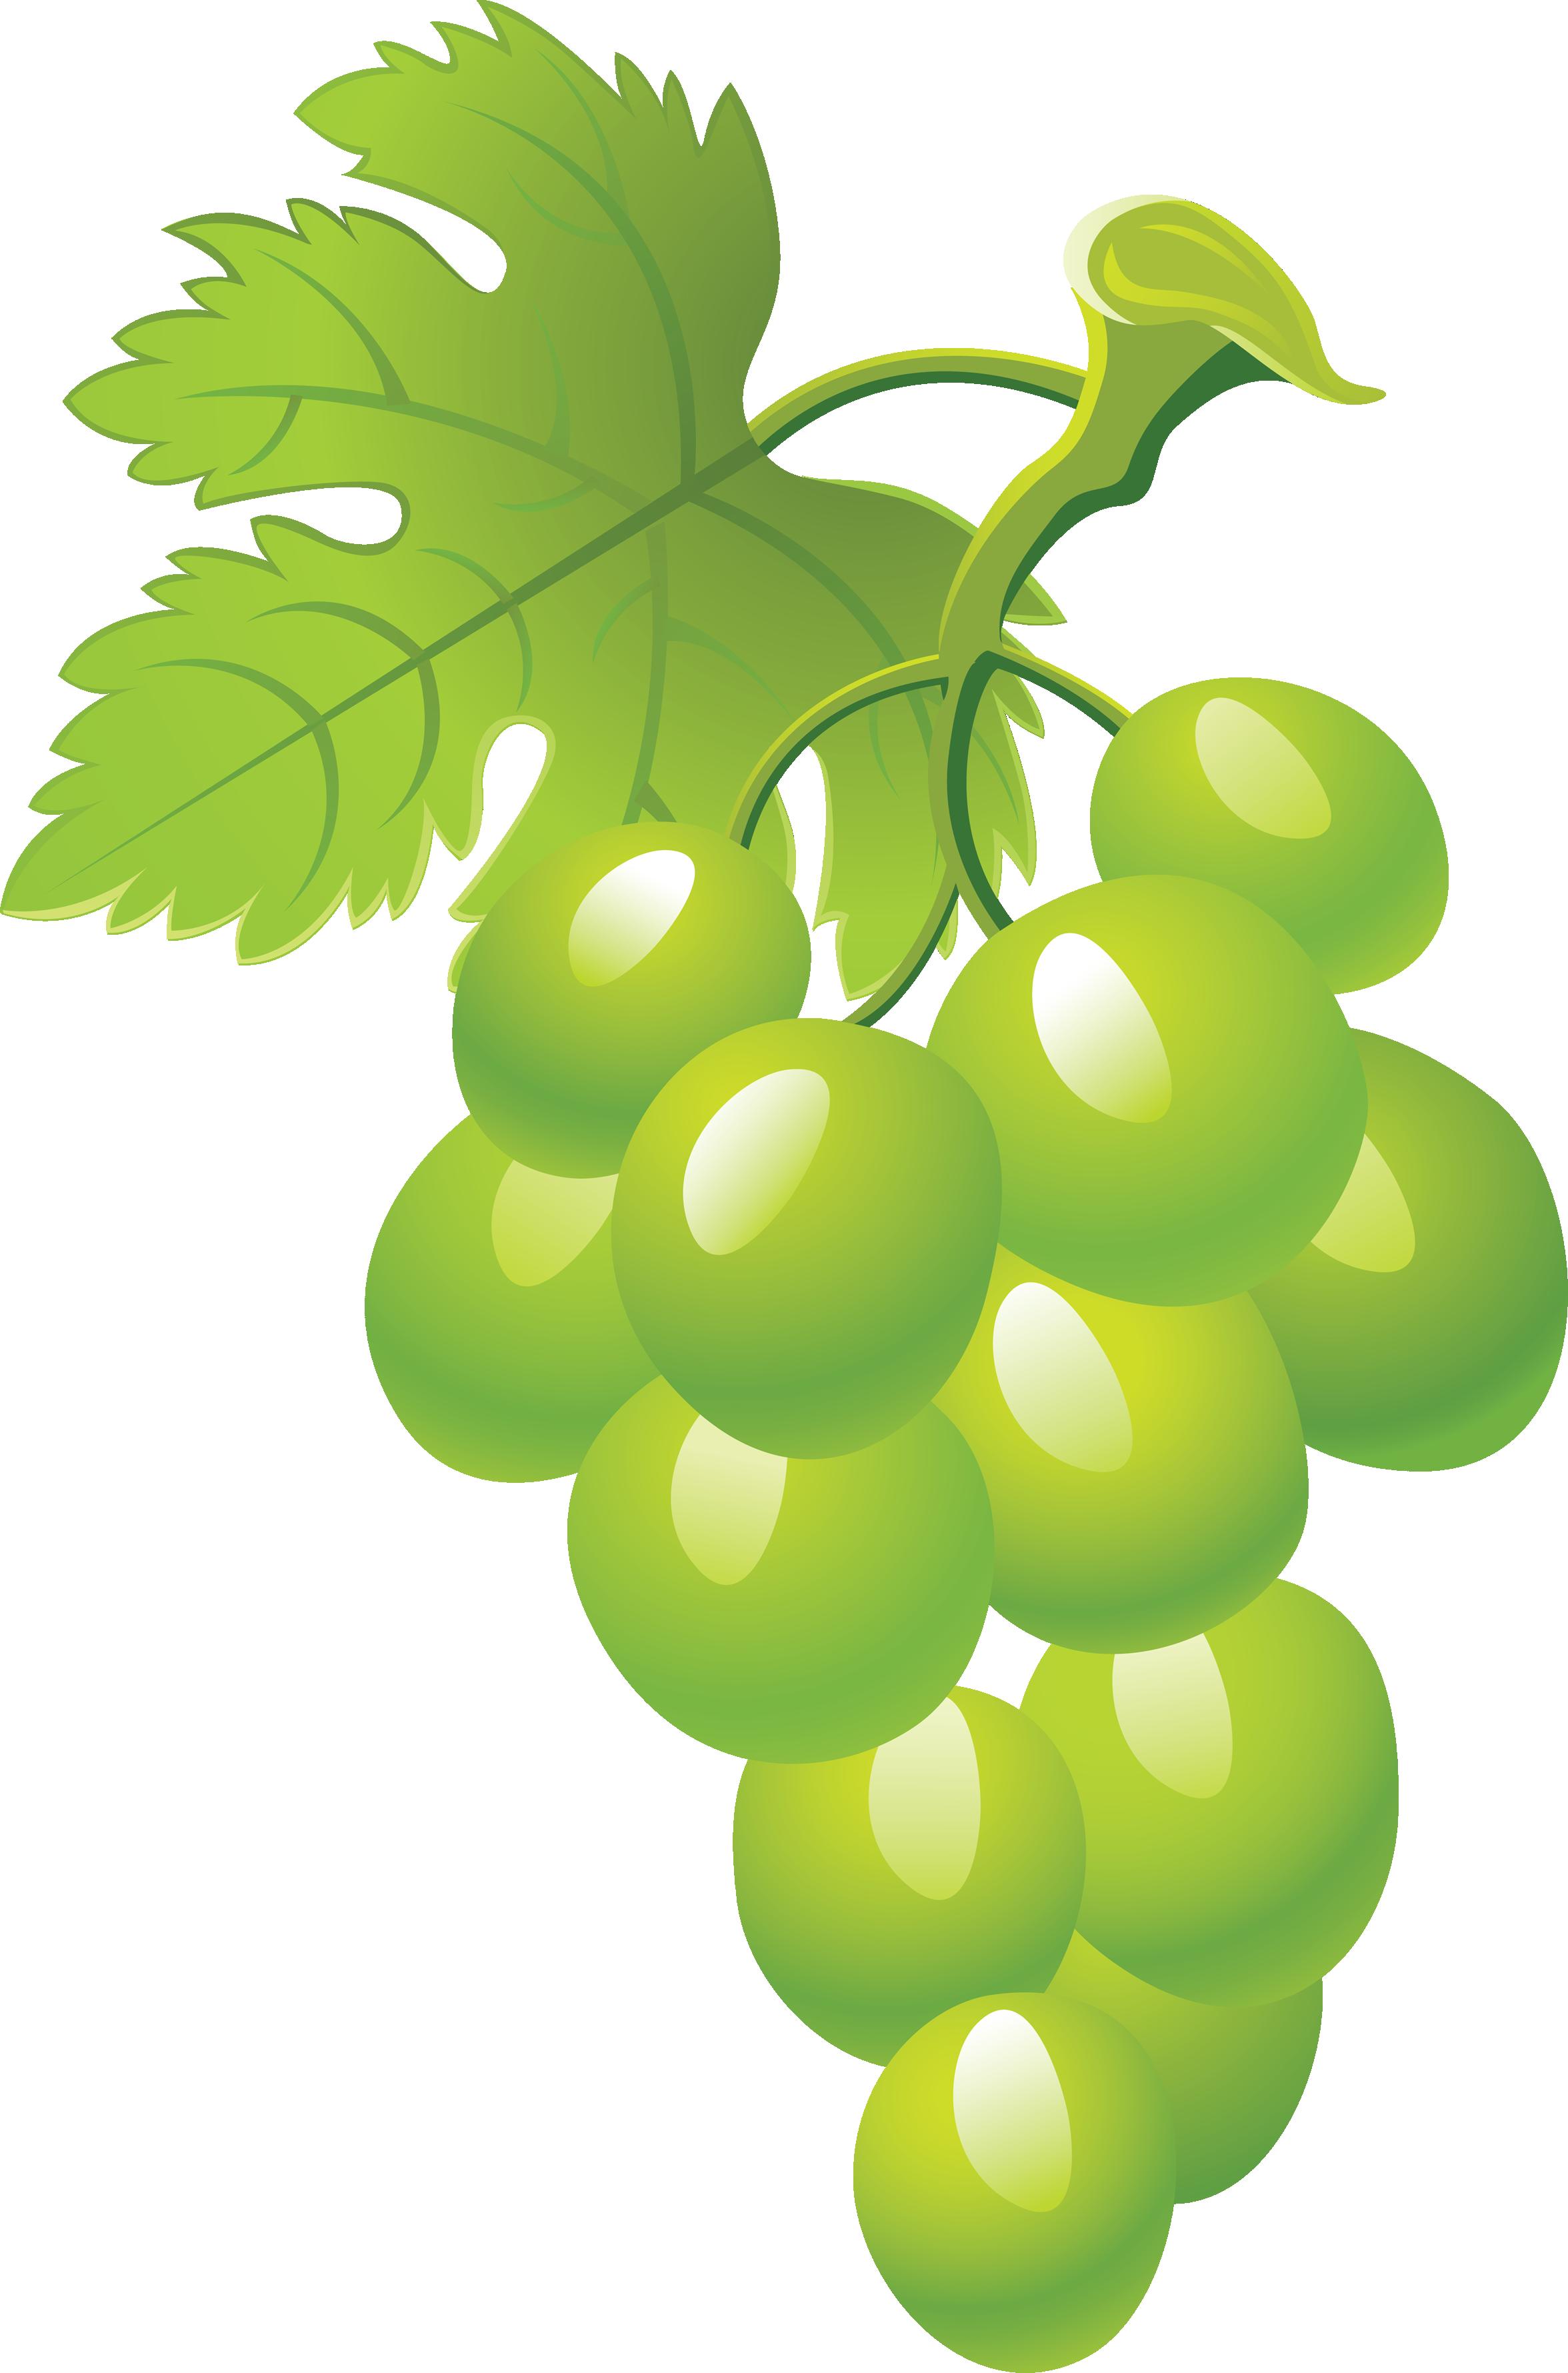 Grapes png image purepng. Grape clipart wine grape